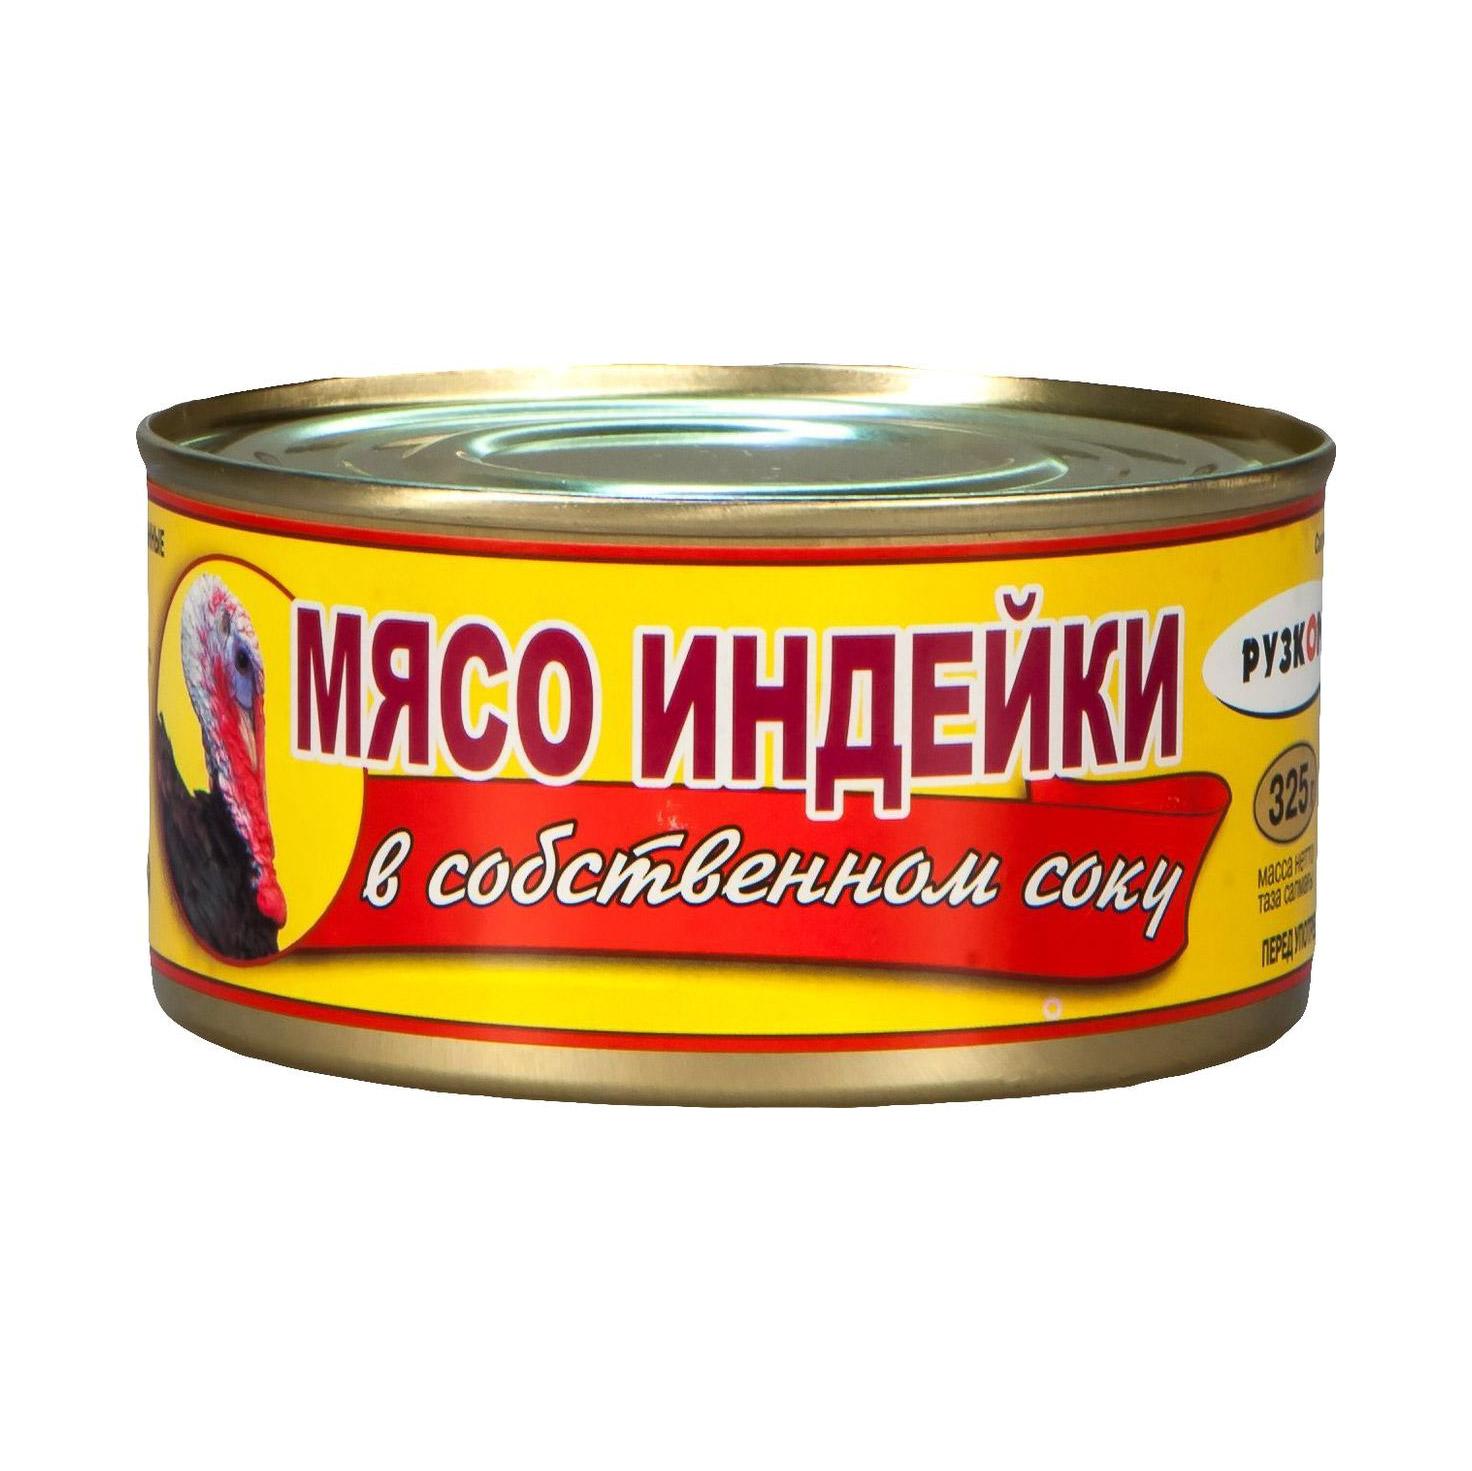 Фото - Мясо индейки Рузком 325 г плов рузком узбекский с говядиной 325 г